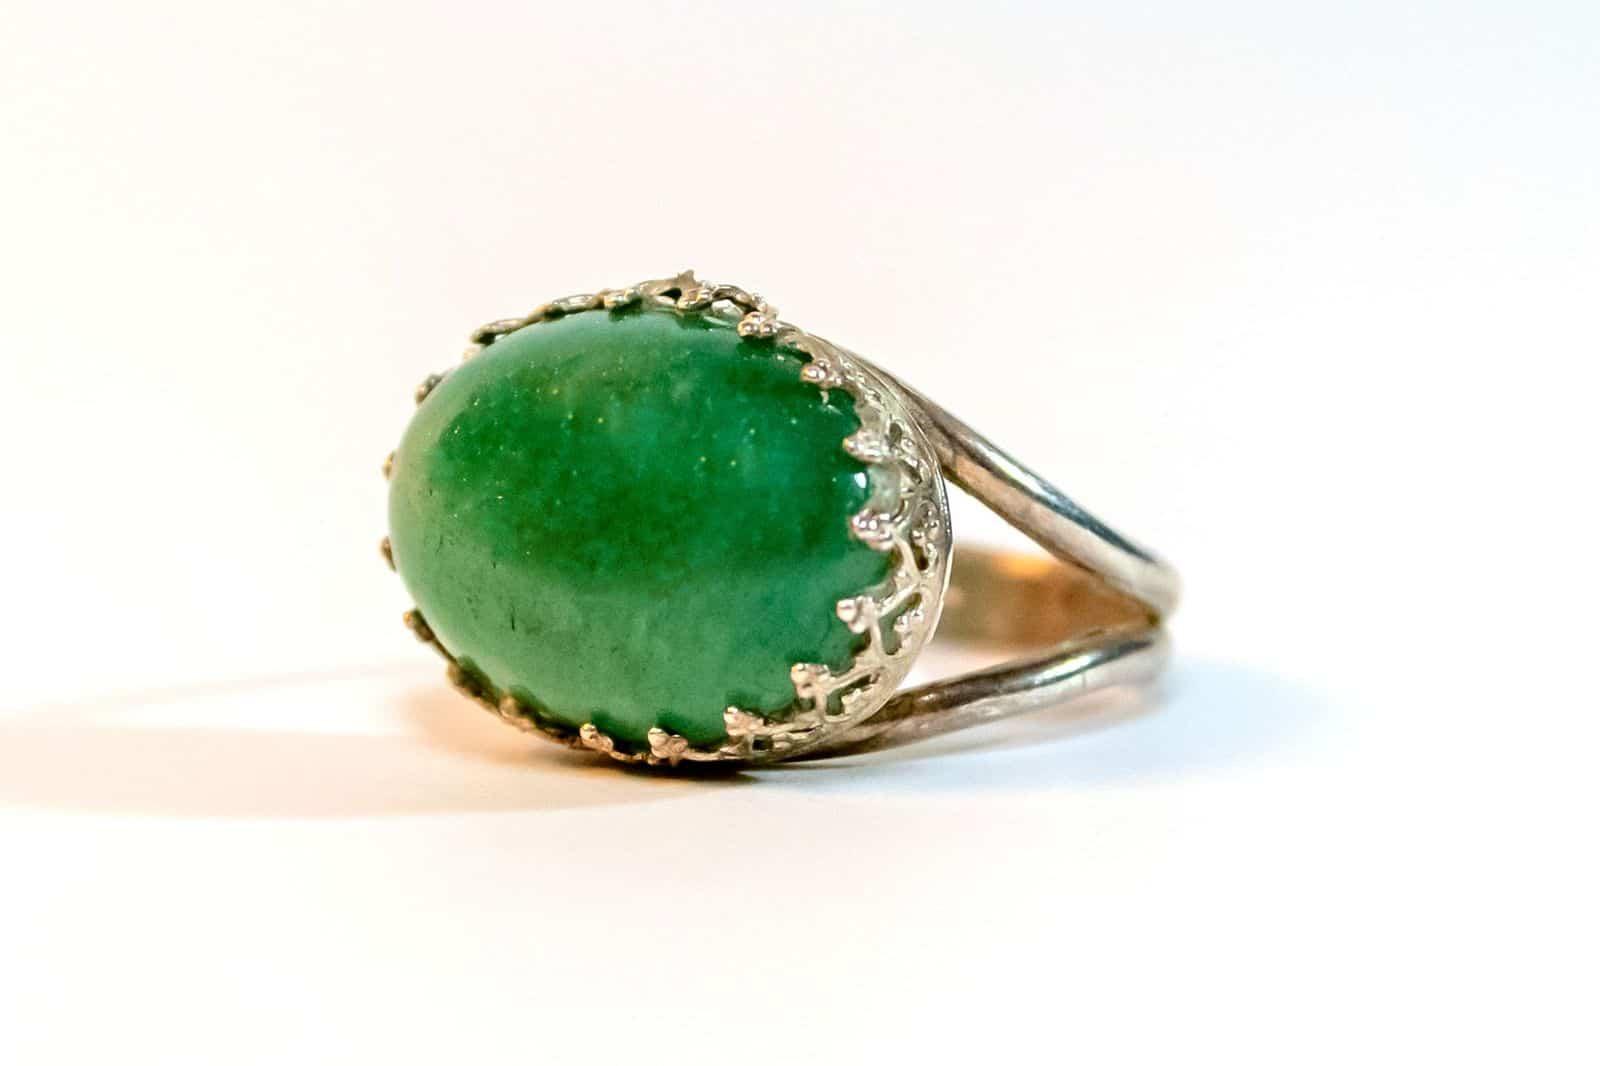 Green Emerald Goldfield - The Healing Stone